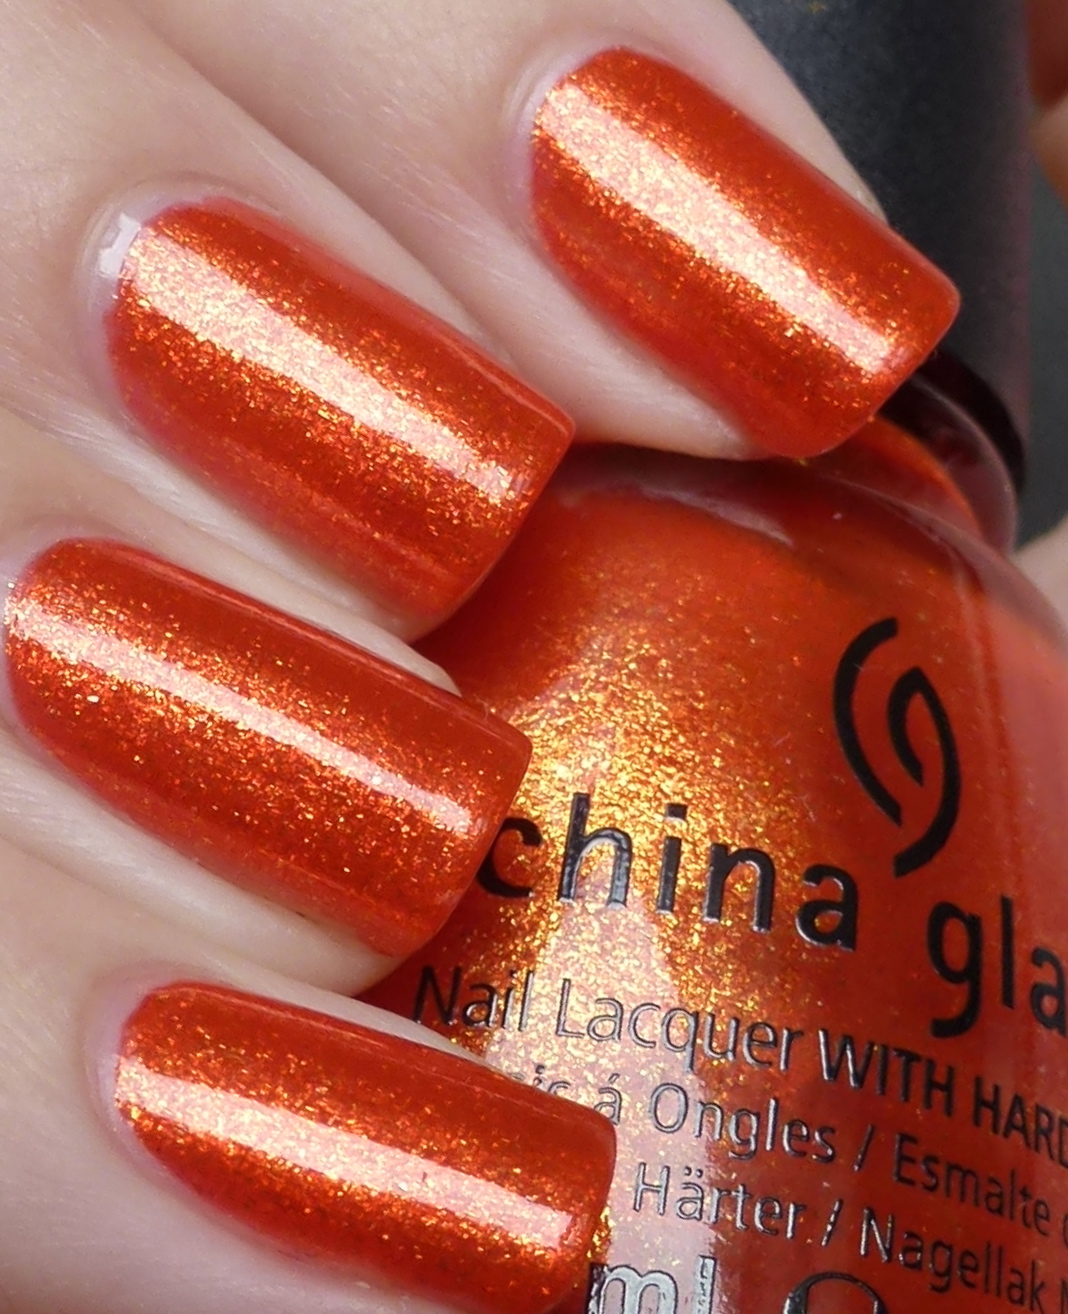 Pinpoint Polish!: Riveting - China Glaze